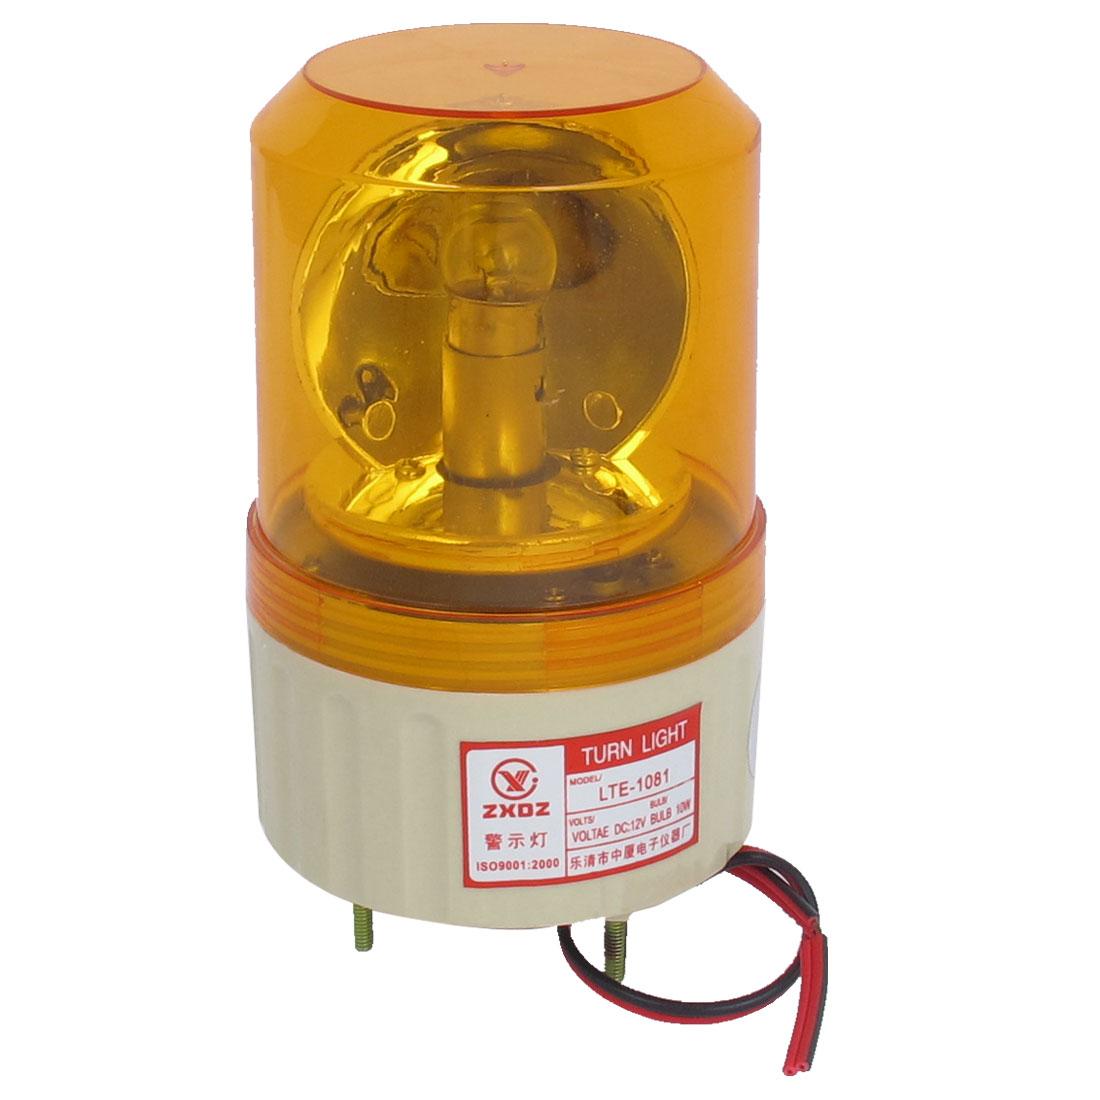 DC 12V Industrial Alarm System Rotating Warning Light Lamp Orange